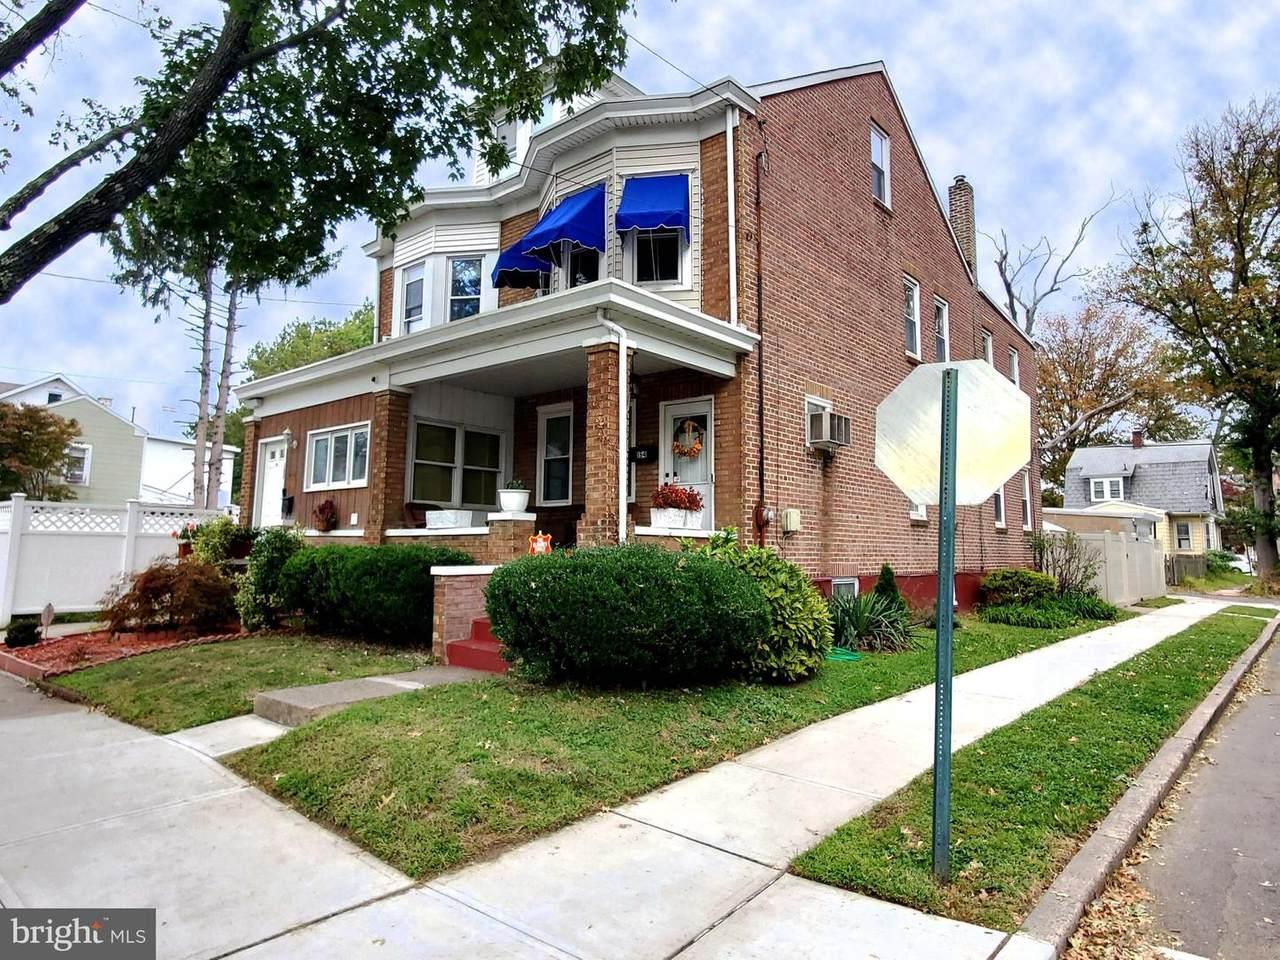 154 Howell Street - Photo 1